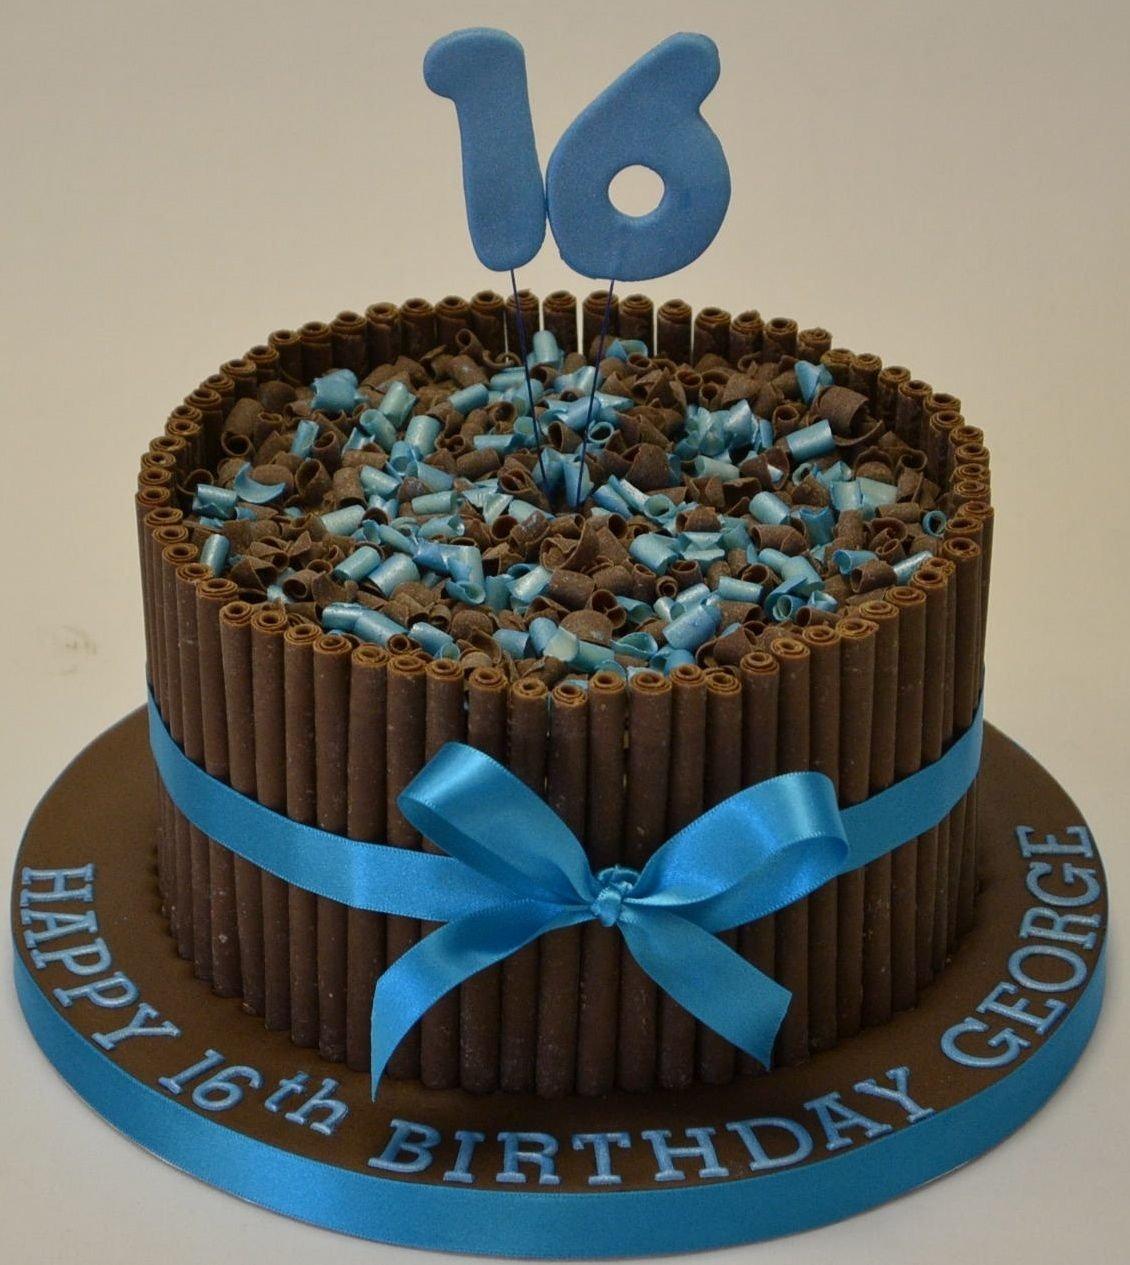 10 Ideal 16Th Birthday Cake Ideas For Boys 16th birthday cakes for boys 16th birthday cigarillo cake cake